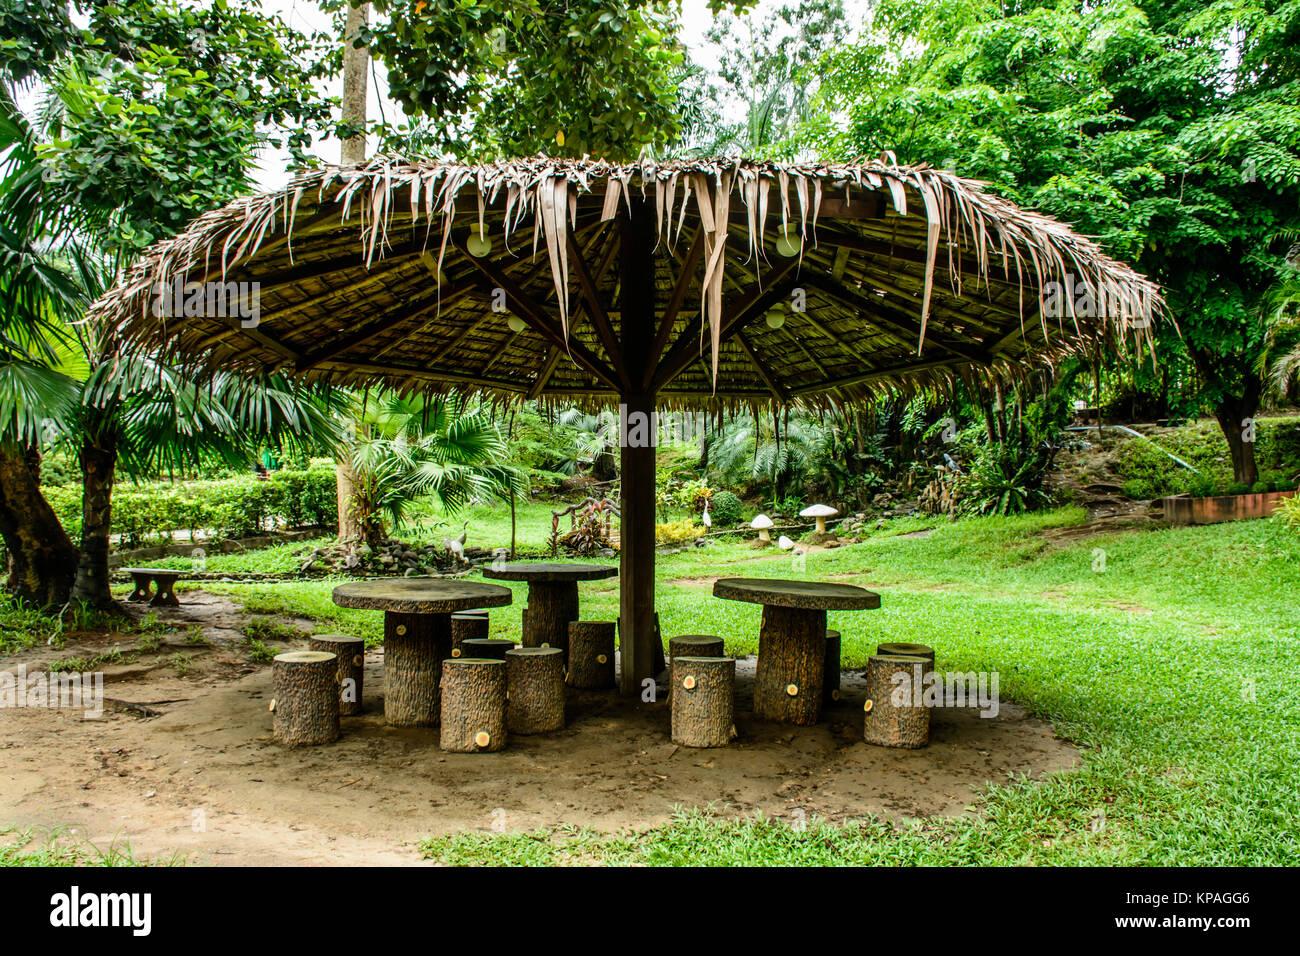 landscape photo of straw umbrella in the park - Stock Image